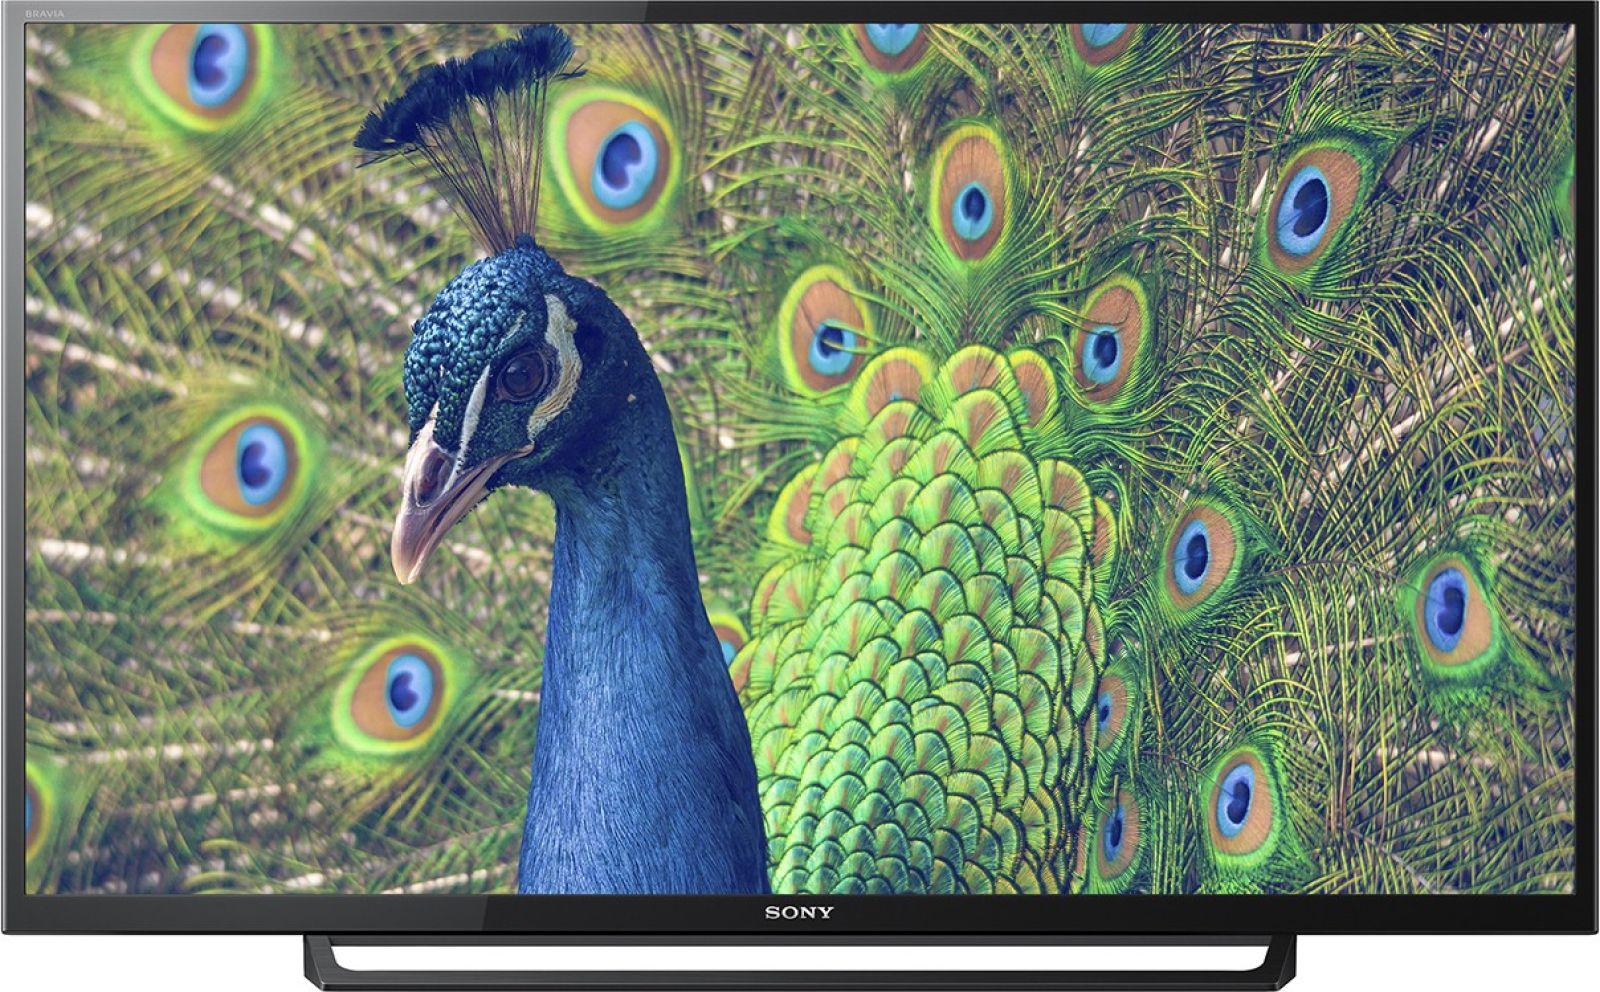 Sony 80cm (32 inch) HD Ready LED TV (KLV-32R302E)